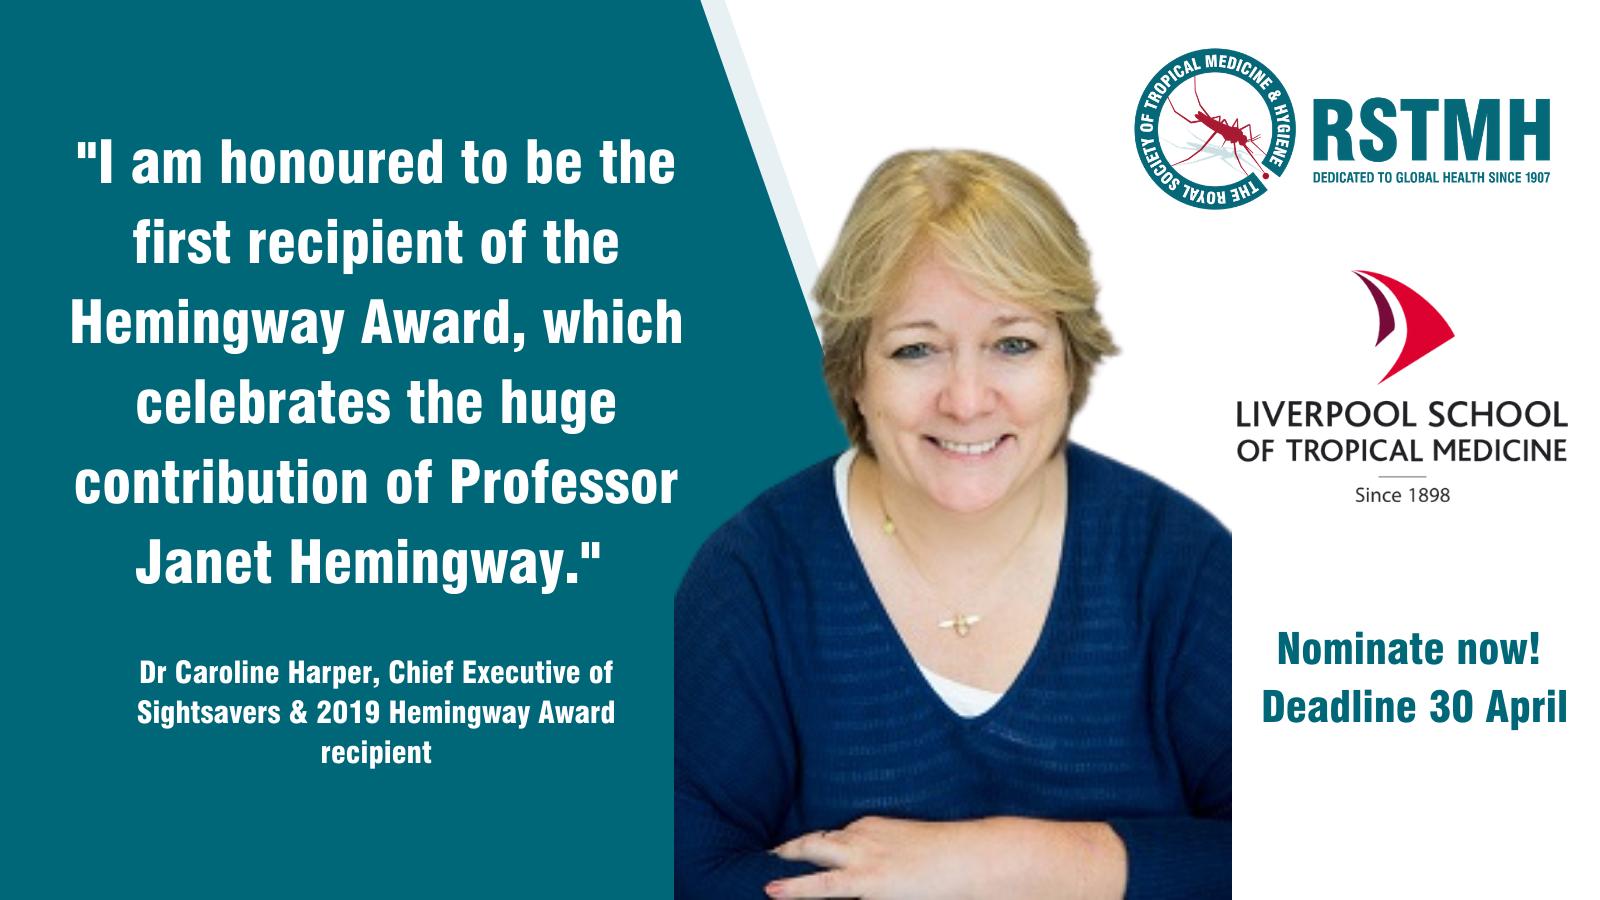 2019 Hemingway Award recipient Dr Caroline Harper, Chief Executive of Sightsavers